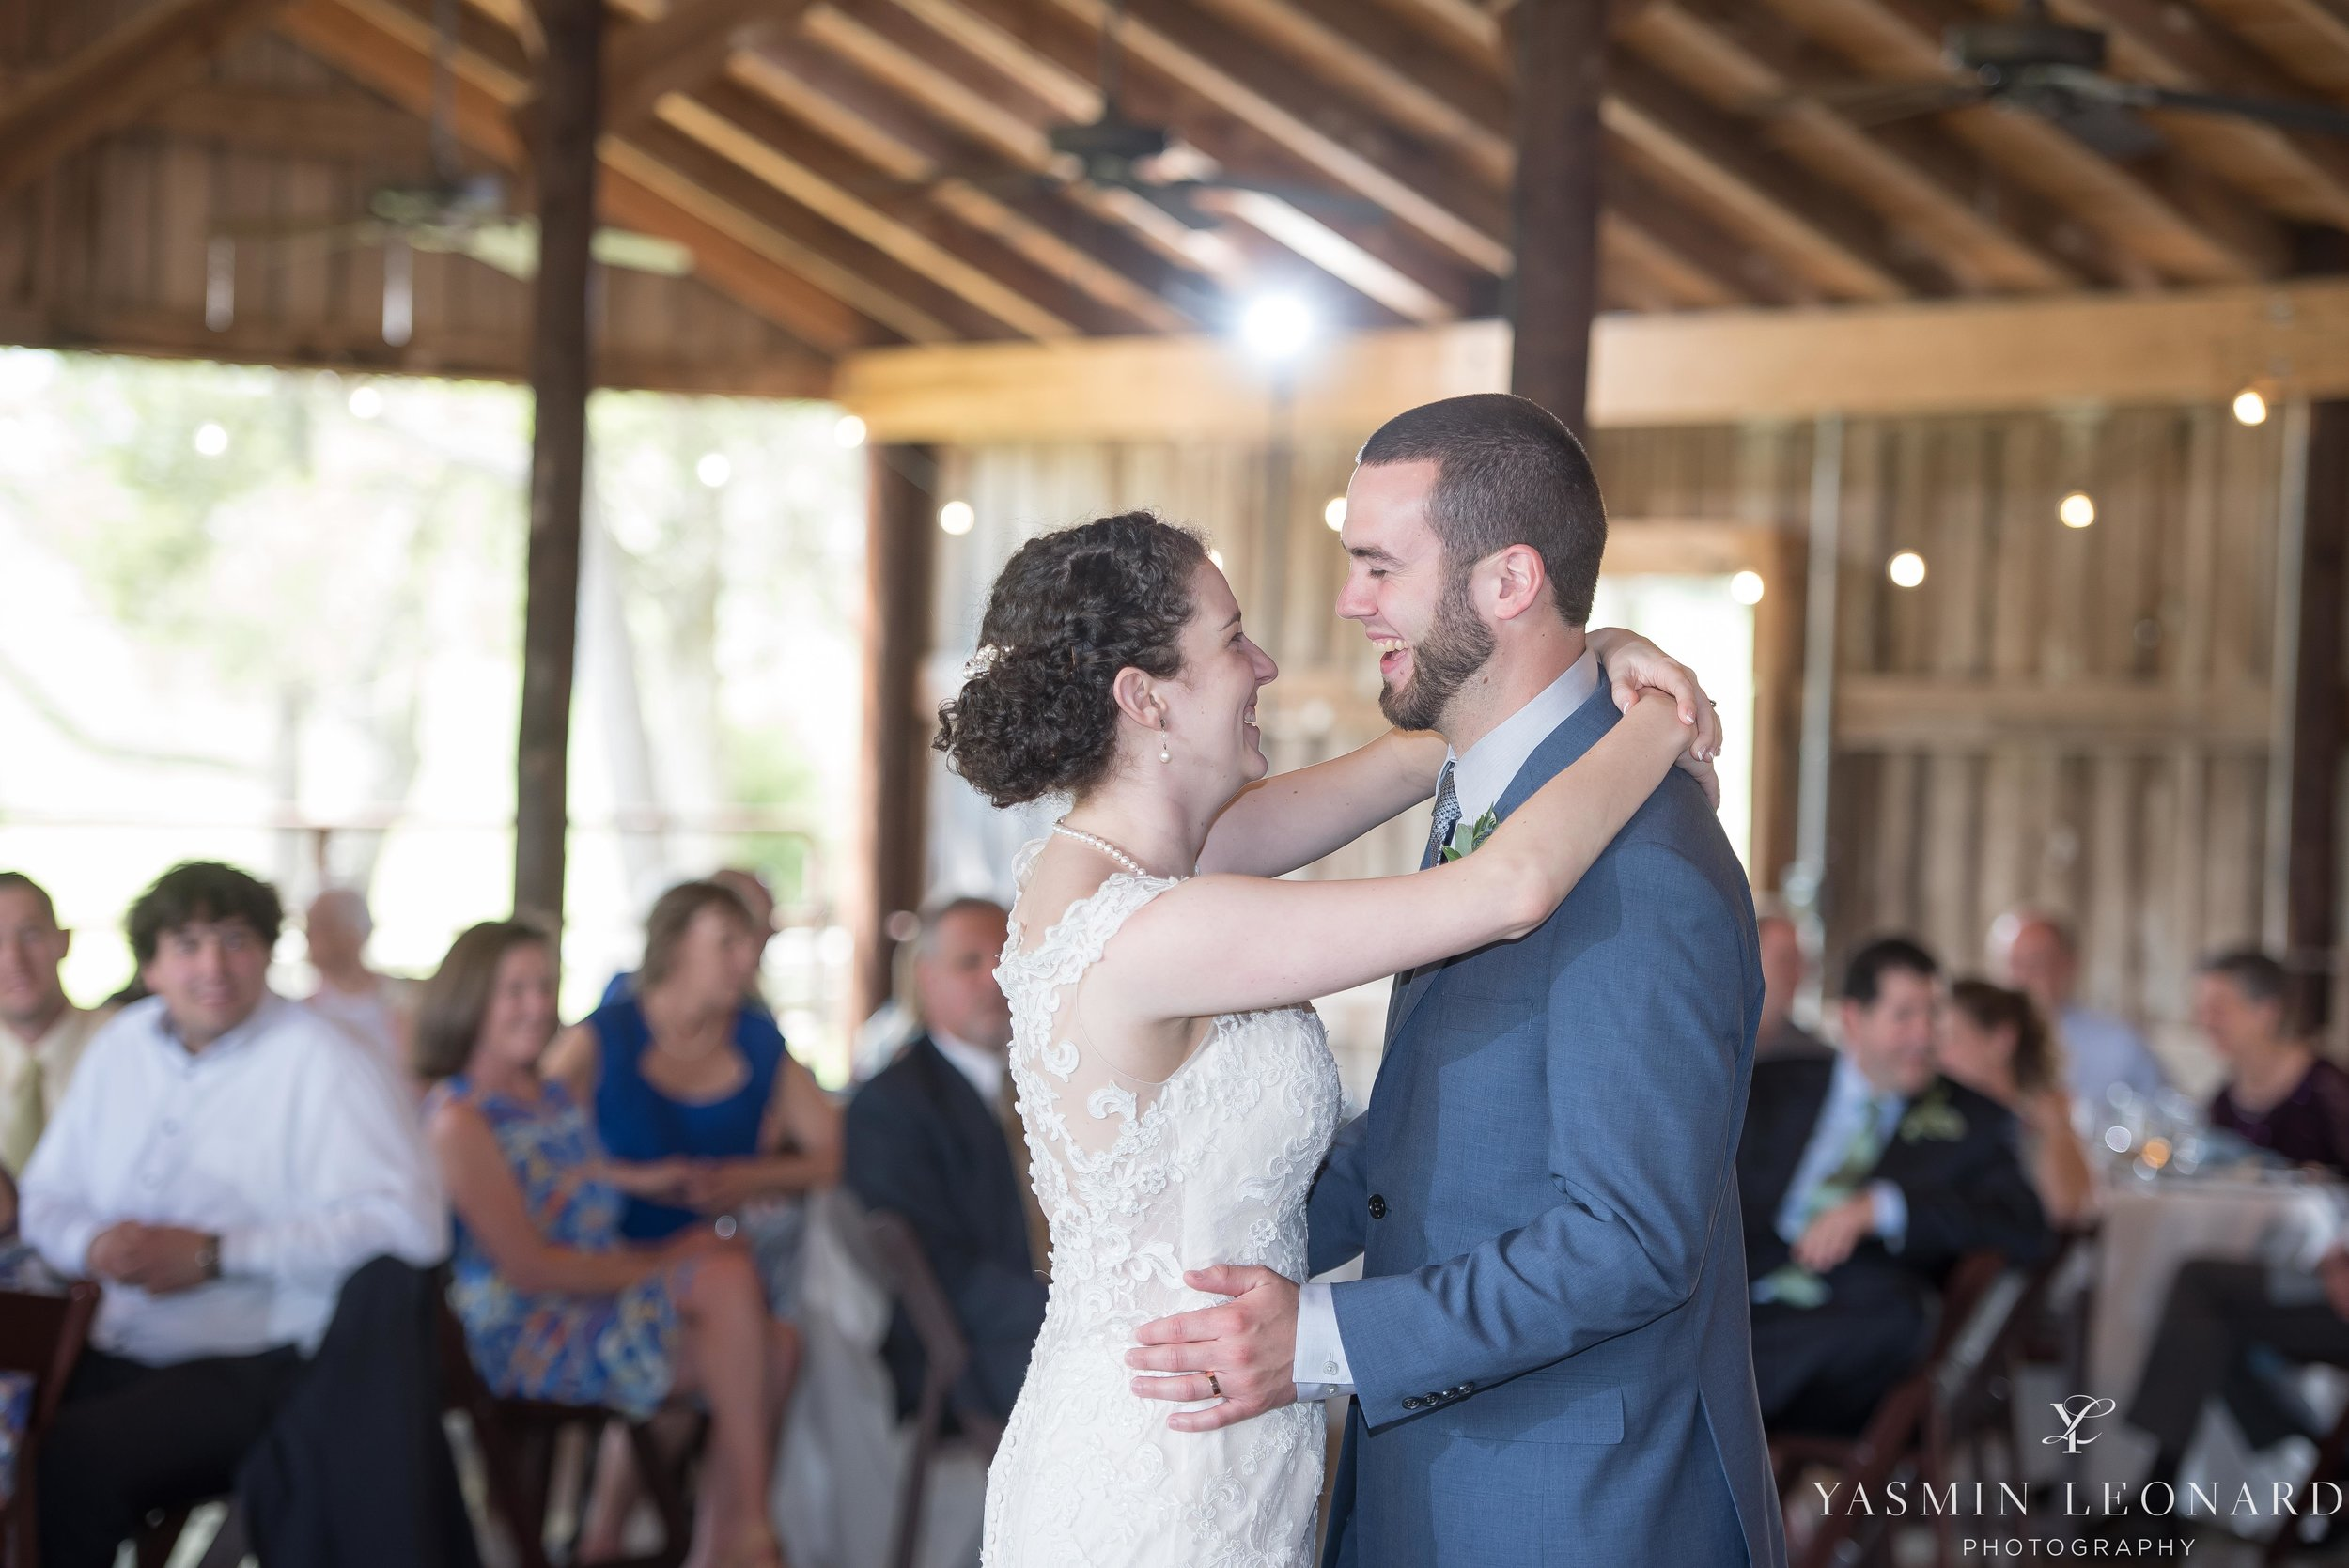 Courtney and Justin - L'abri at Linwood - Yasmin Leonard Photography-53.jpg